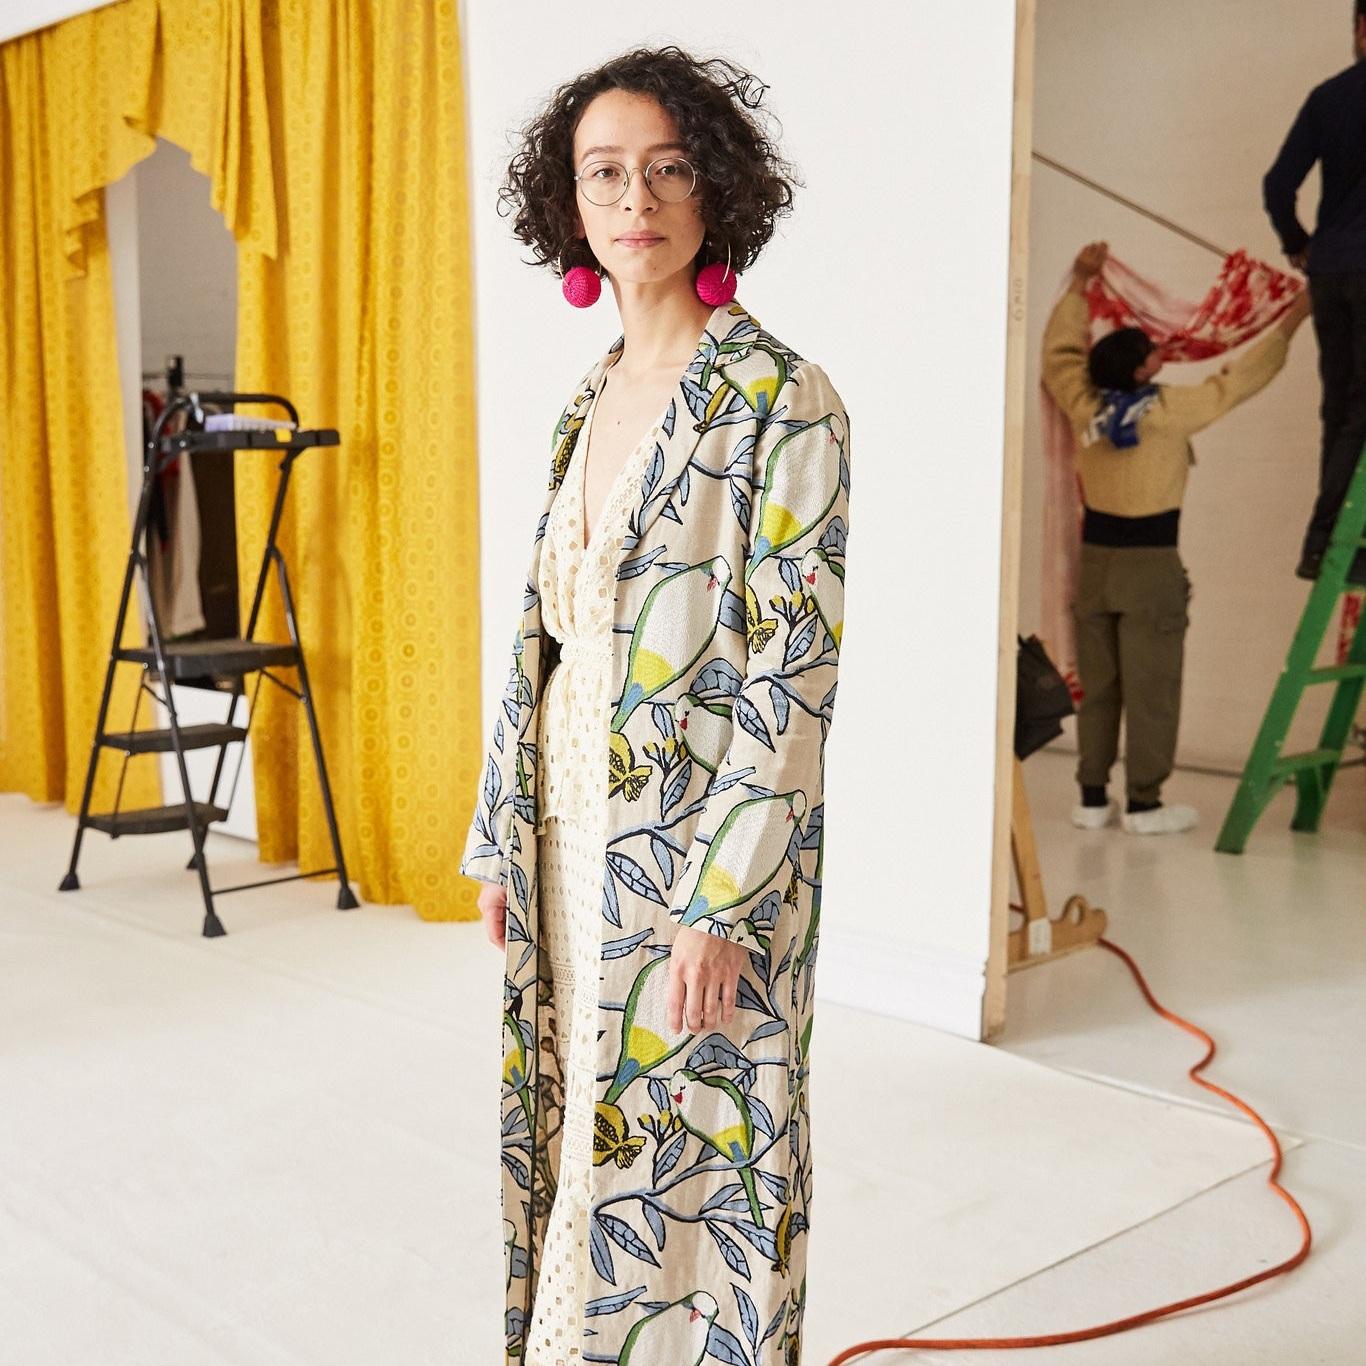 DIDI ROJAS Dos Loros Kimono  #ceramist #plasticartist #girlboss #almagirl  @The New York Times shoot, NYC